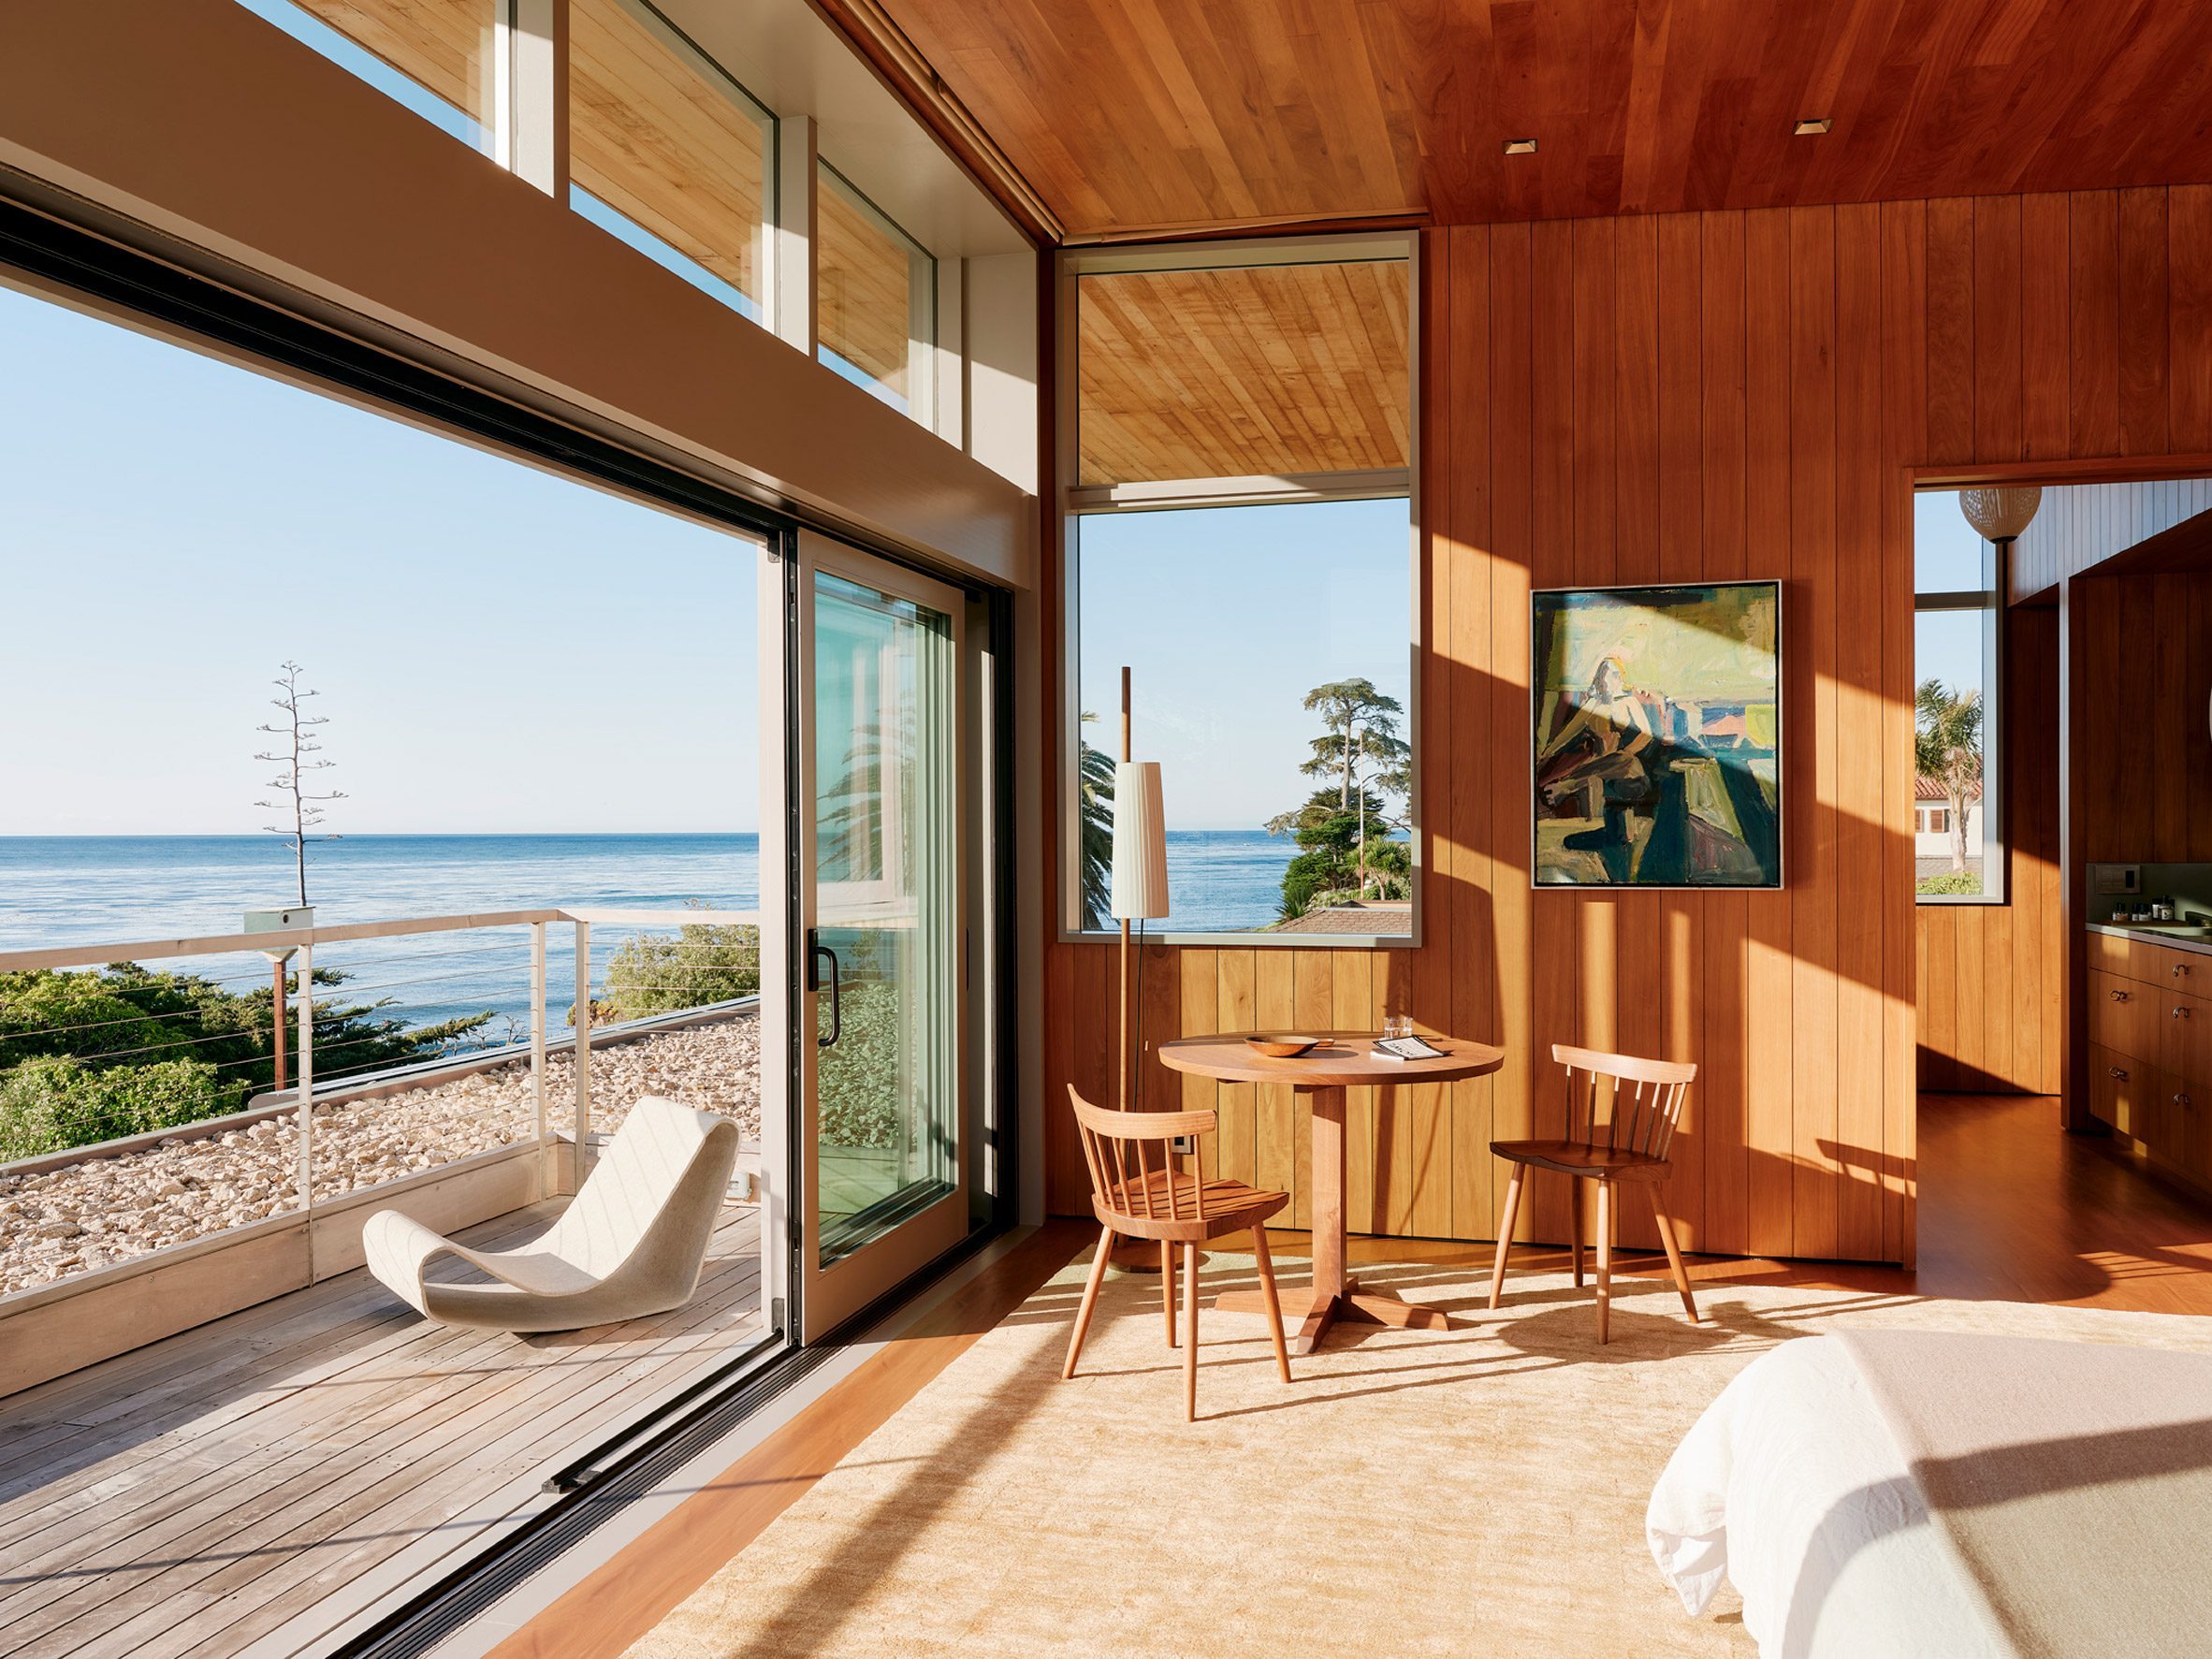 Surf House has panoramic ocean views